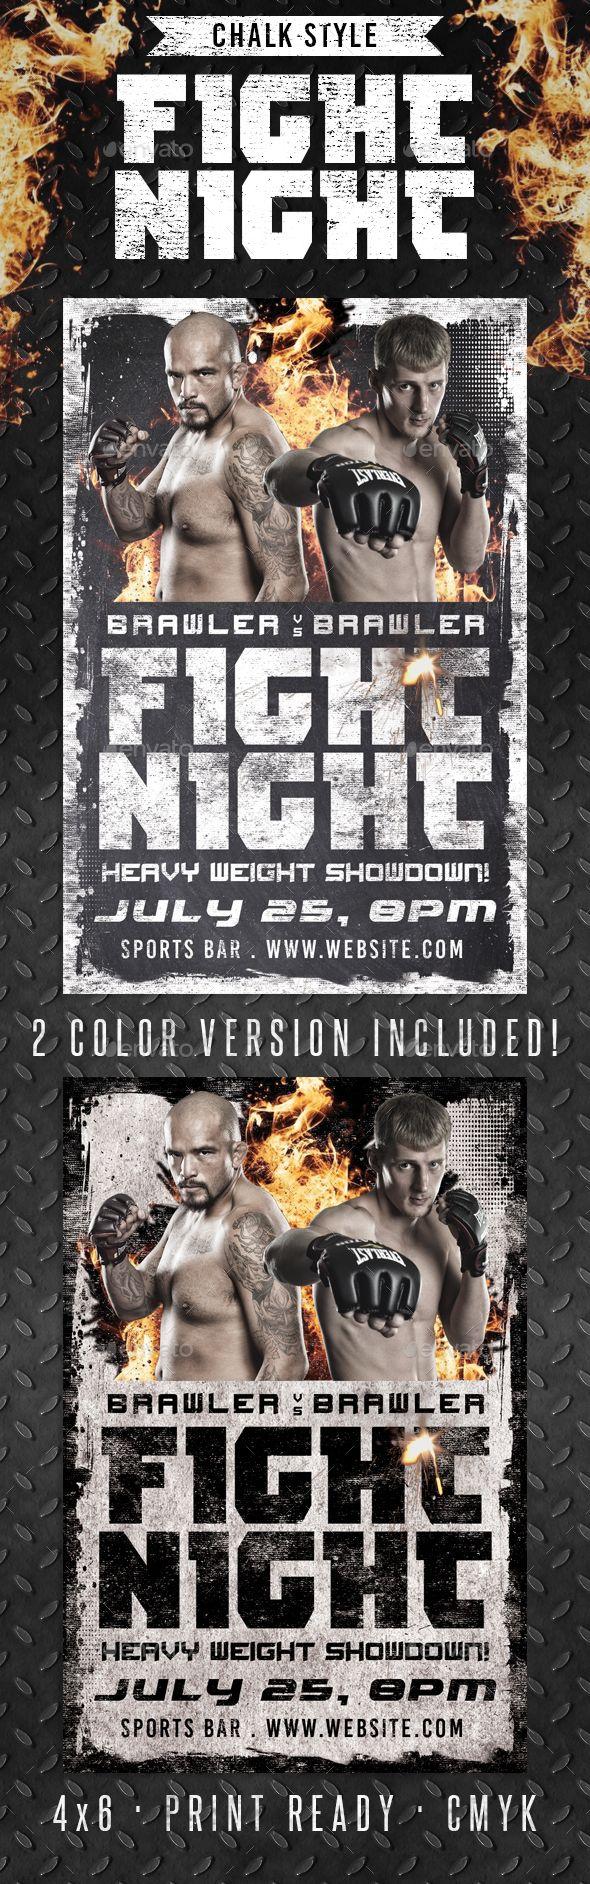 Chalk Fight Night MMA Boxing Flyer